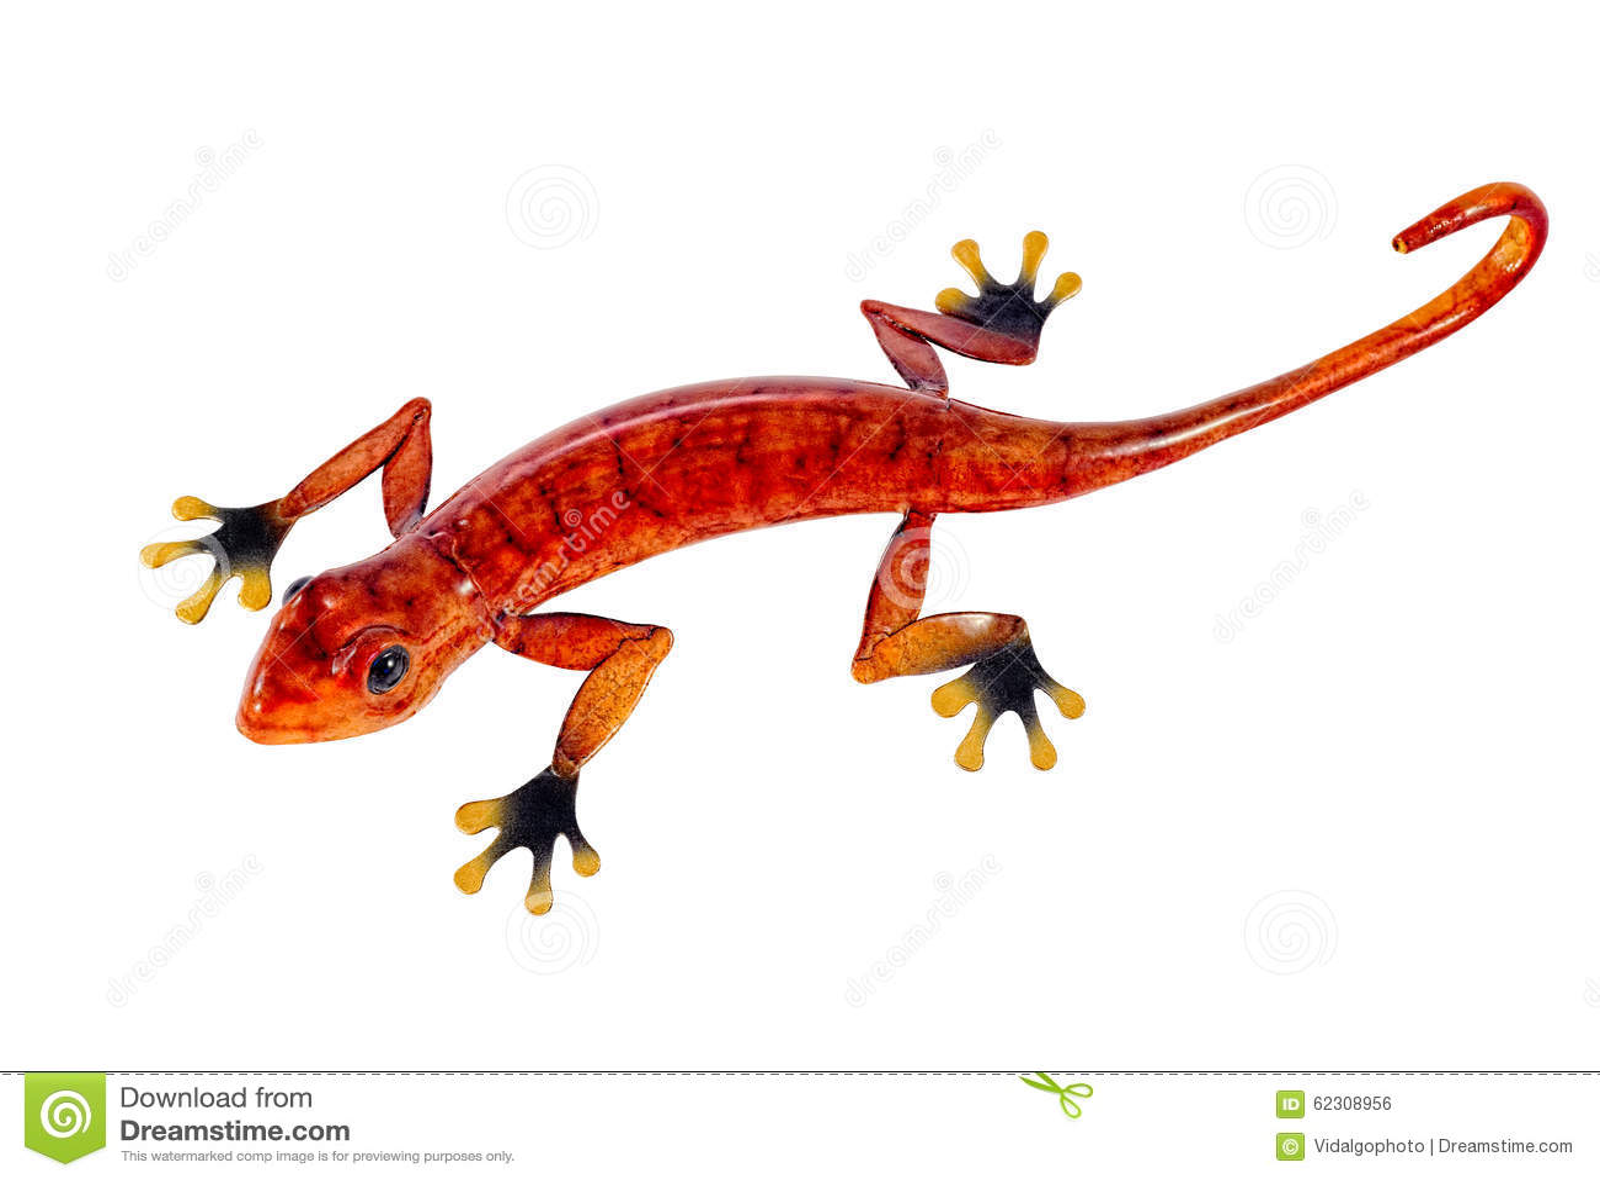 salamander white background - photo #22